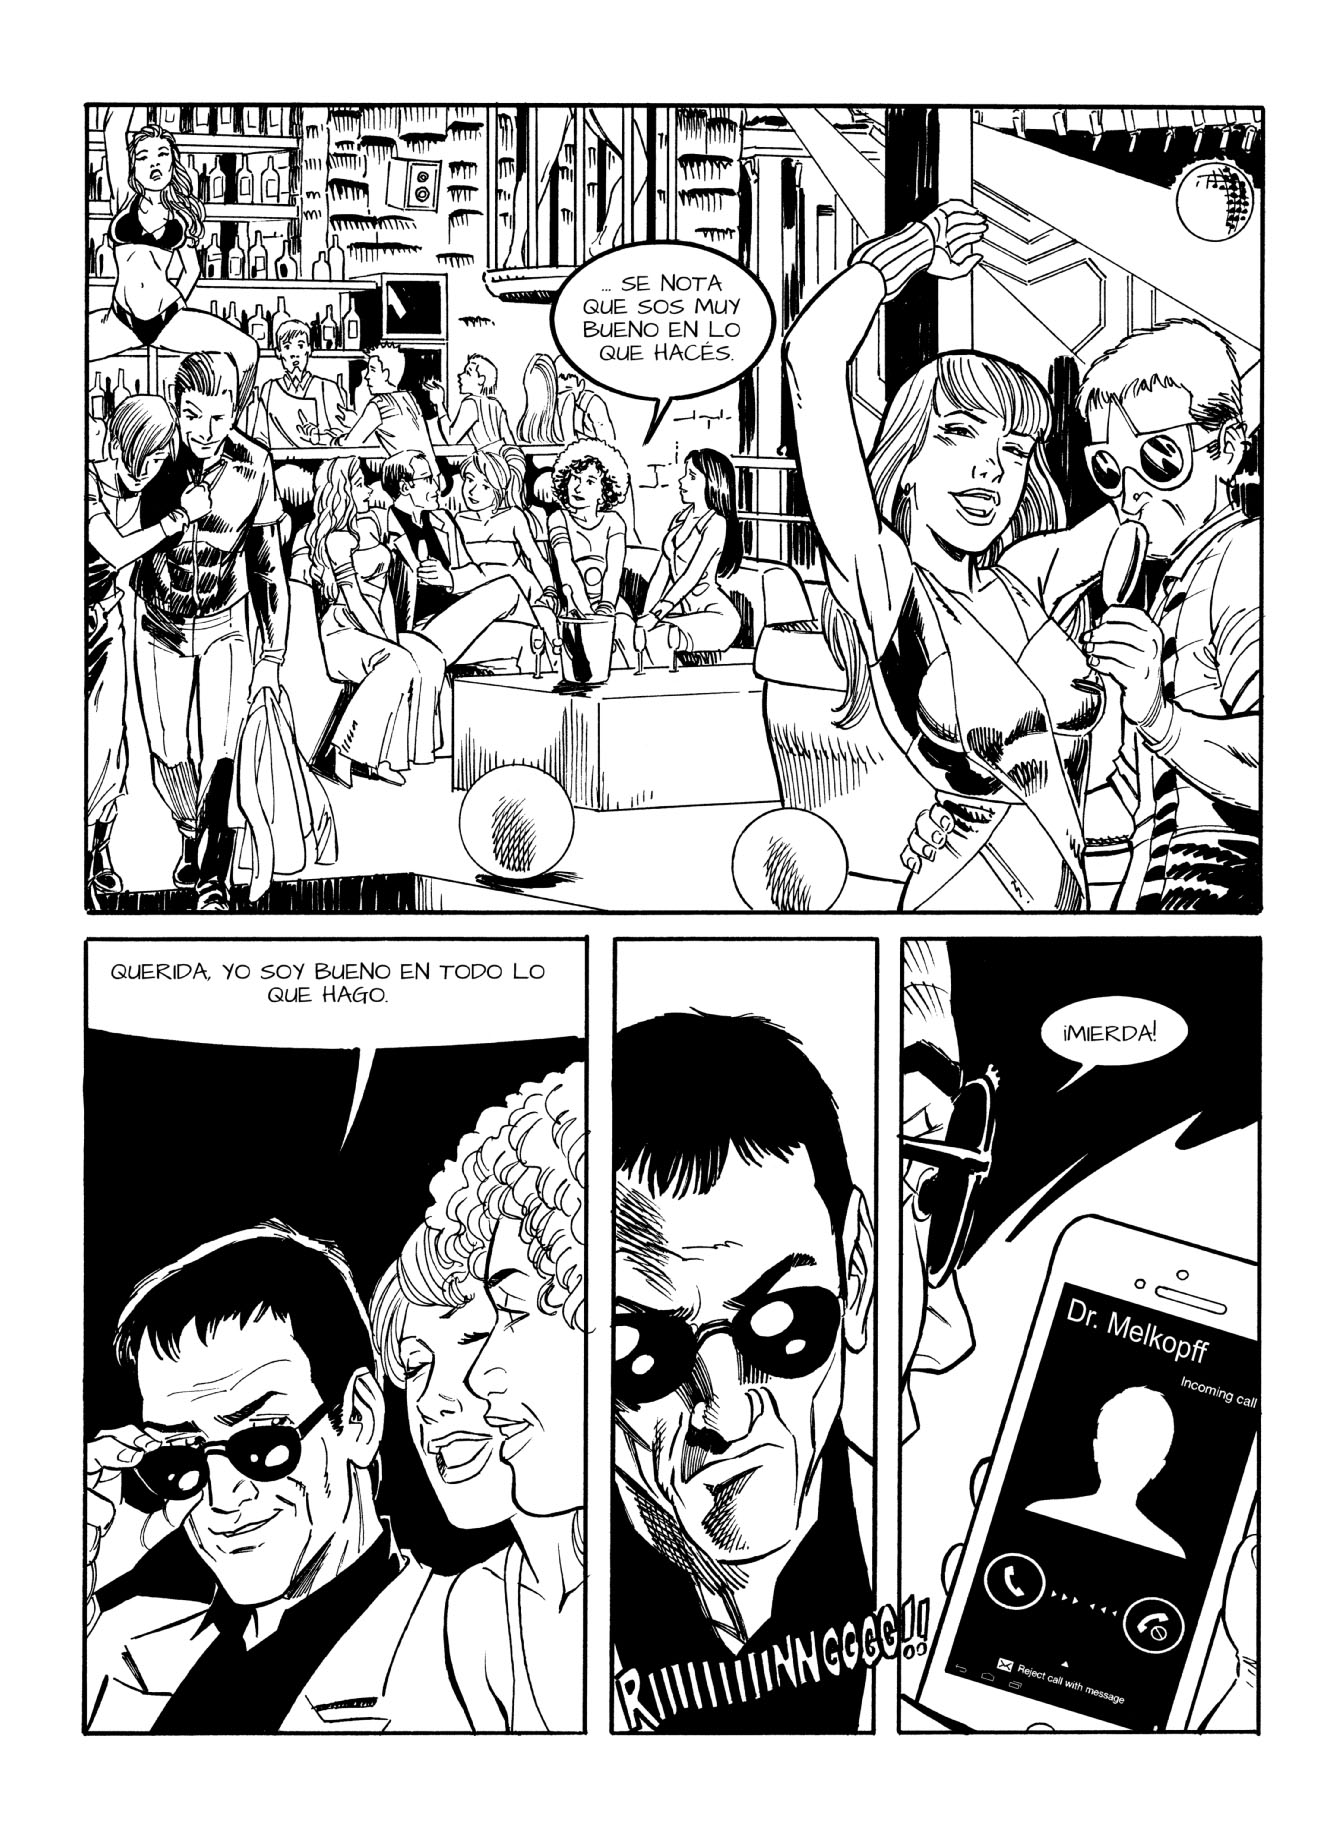 SpectrumWarriors-issue-01-page-03